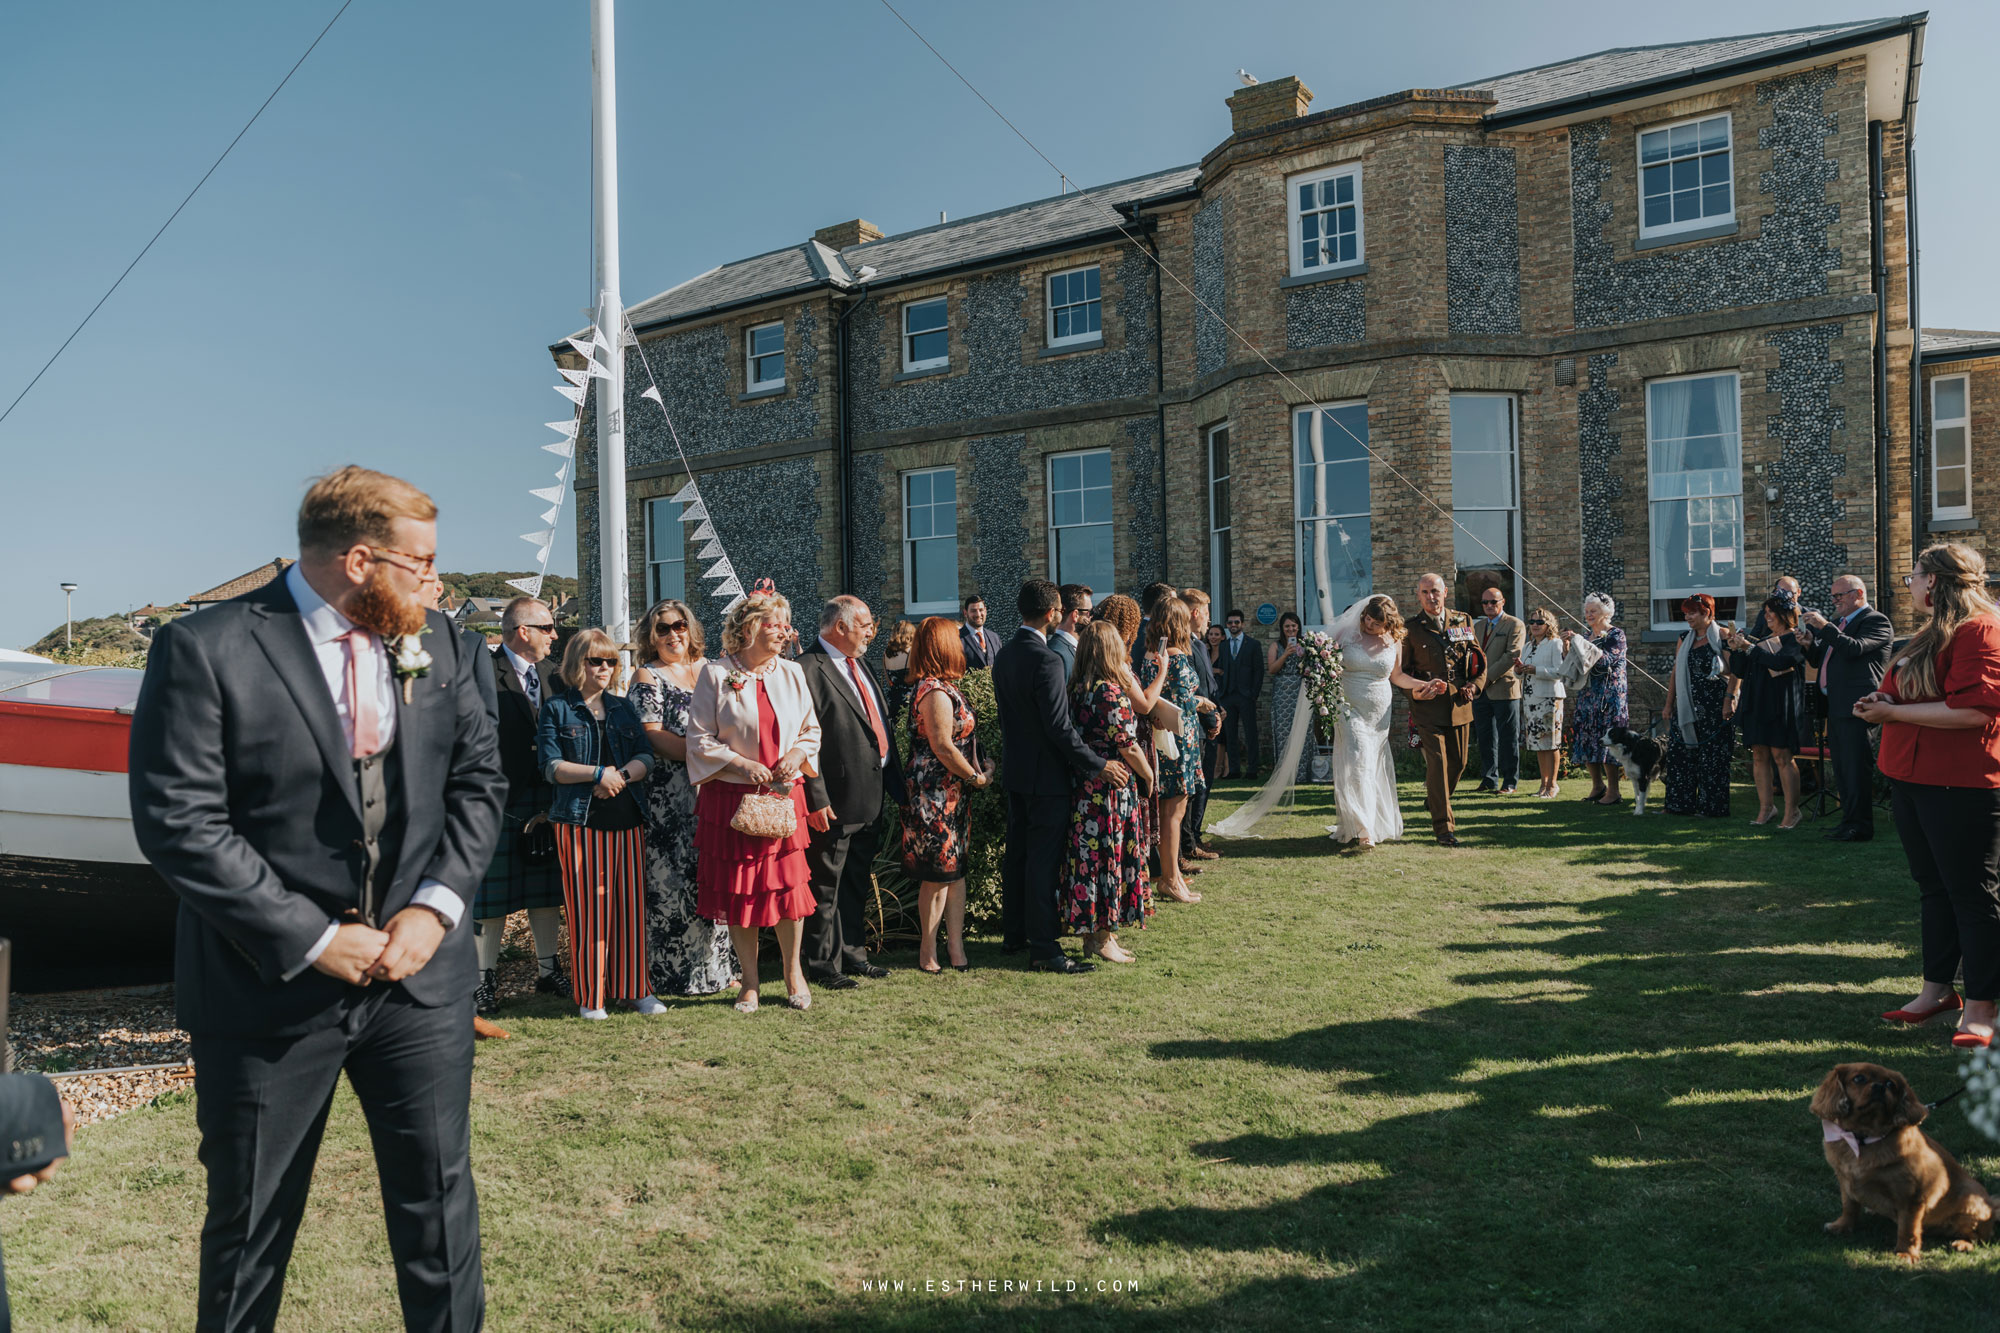 Cromer_Wedding_Beach_Outdoor_Ceremony_Norfolk_North_Lodge_Registry_Office_Rocket_House_Cafe_Cromer_Pier_IMG_3687.jpg